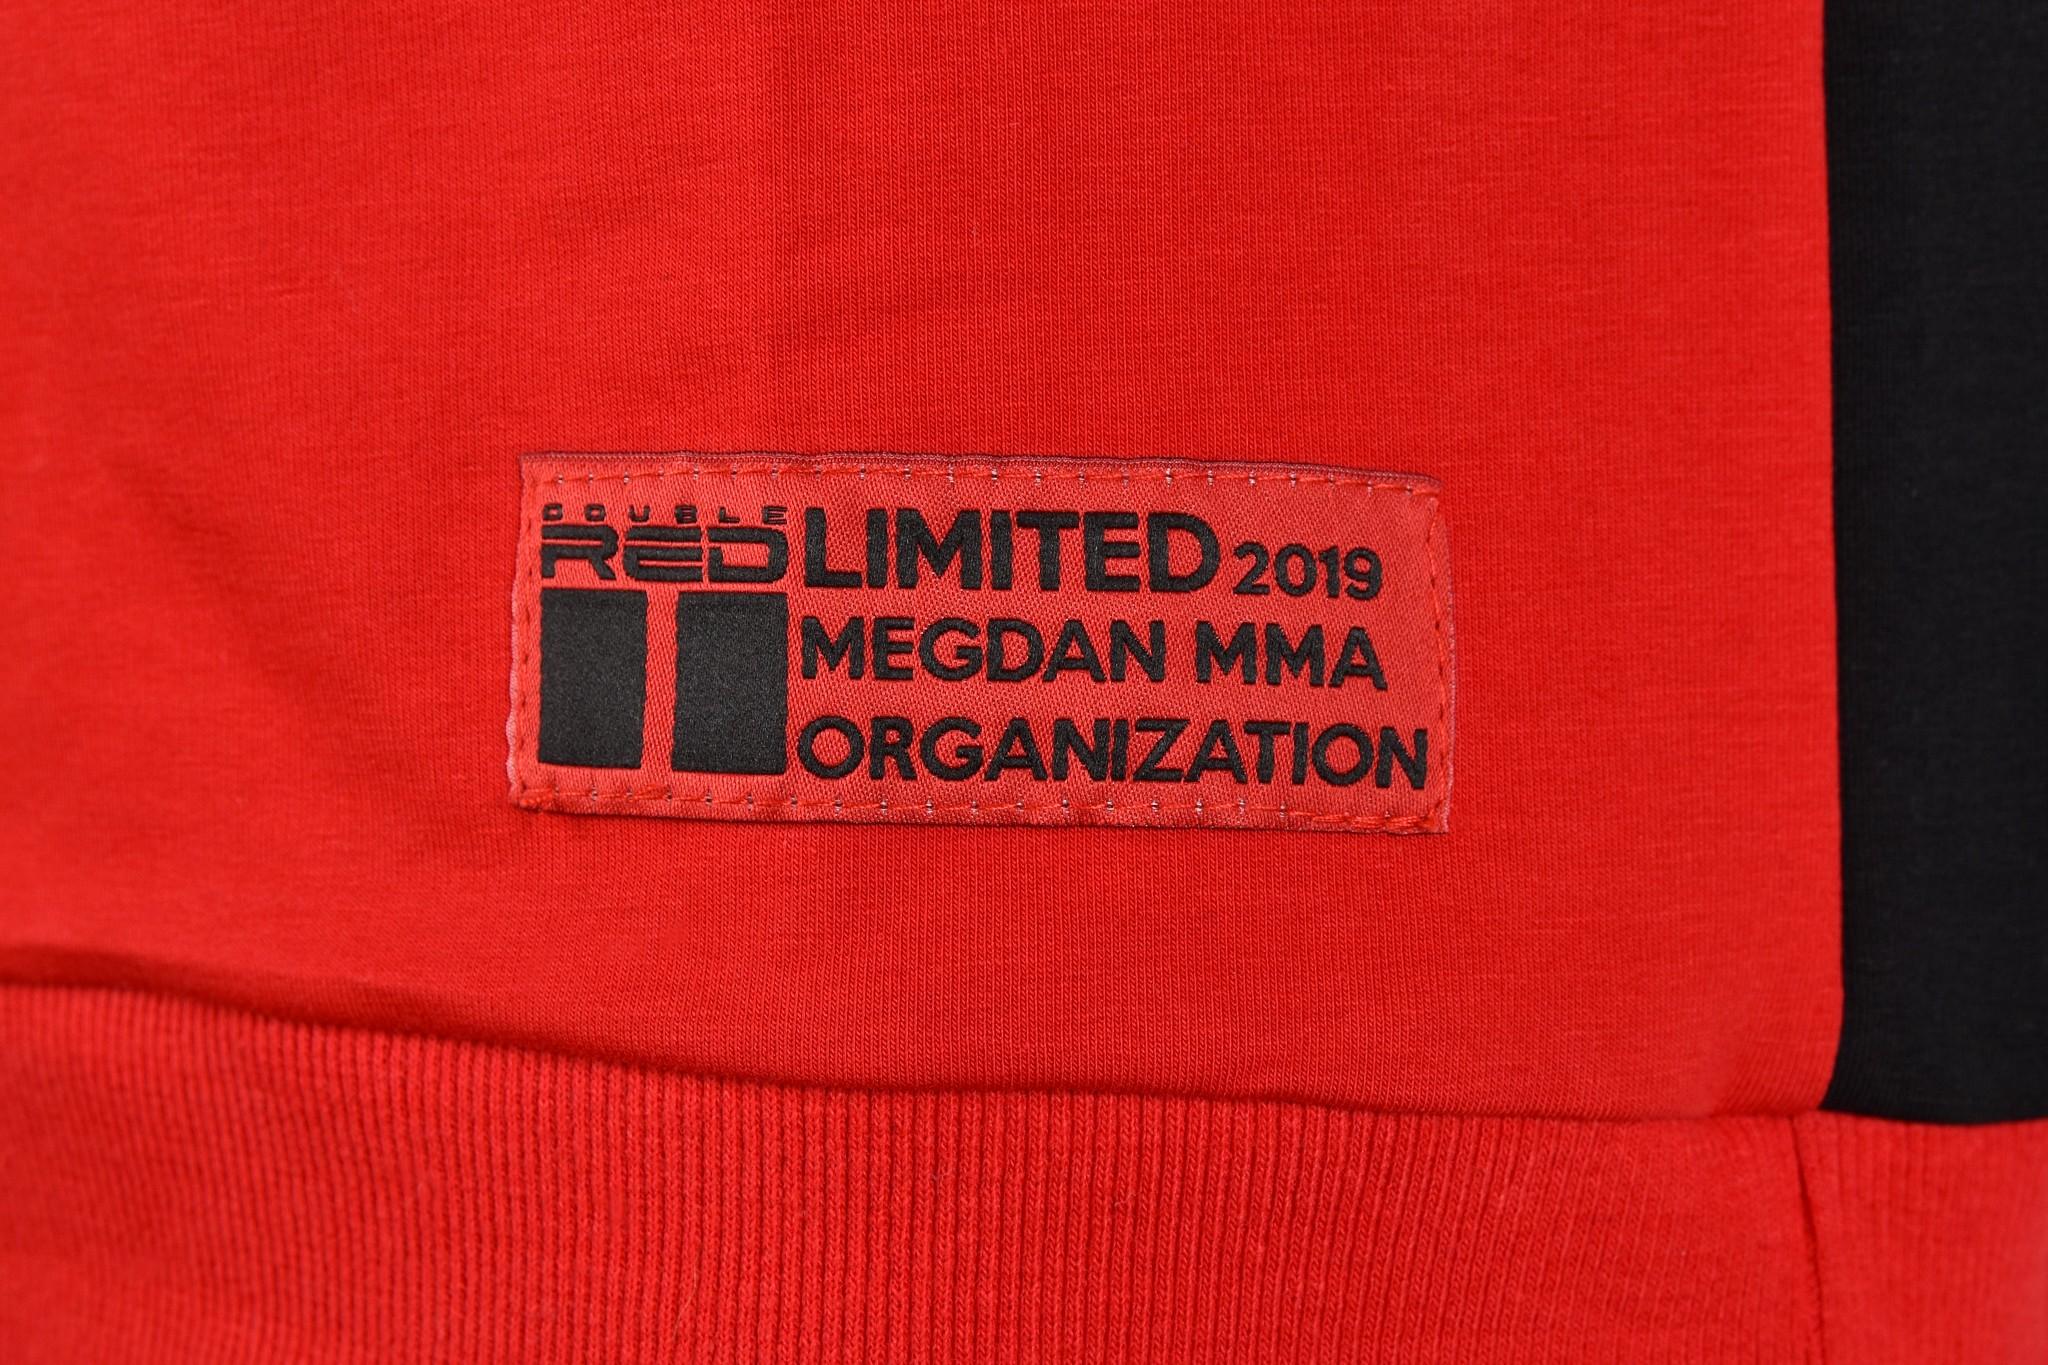 Sweatshirt MMA RULES Megdan Fighting